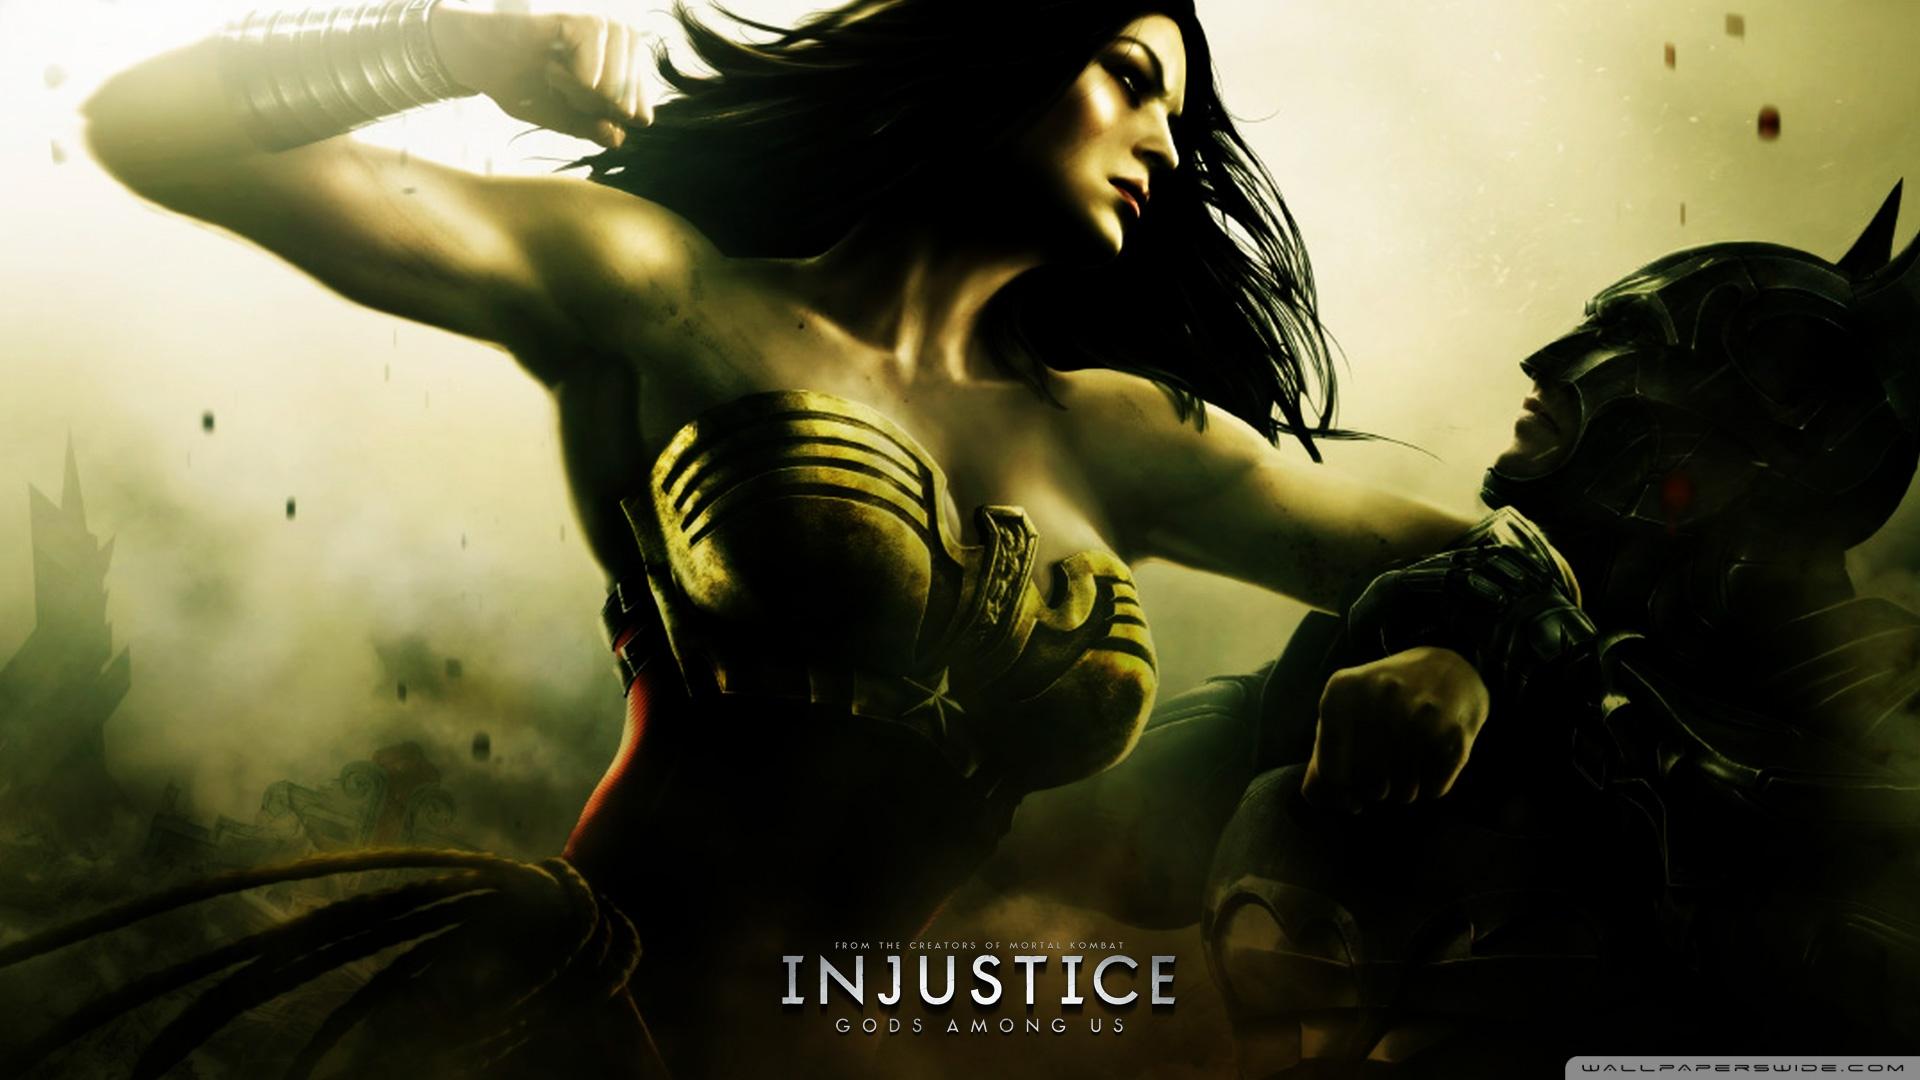 Injustice Gods Among Us - Batman vs Wonder Woman HD desktop